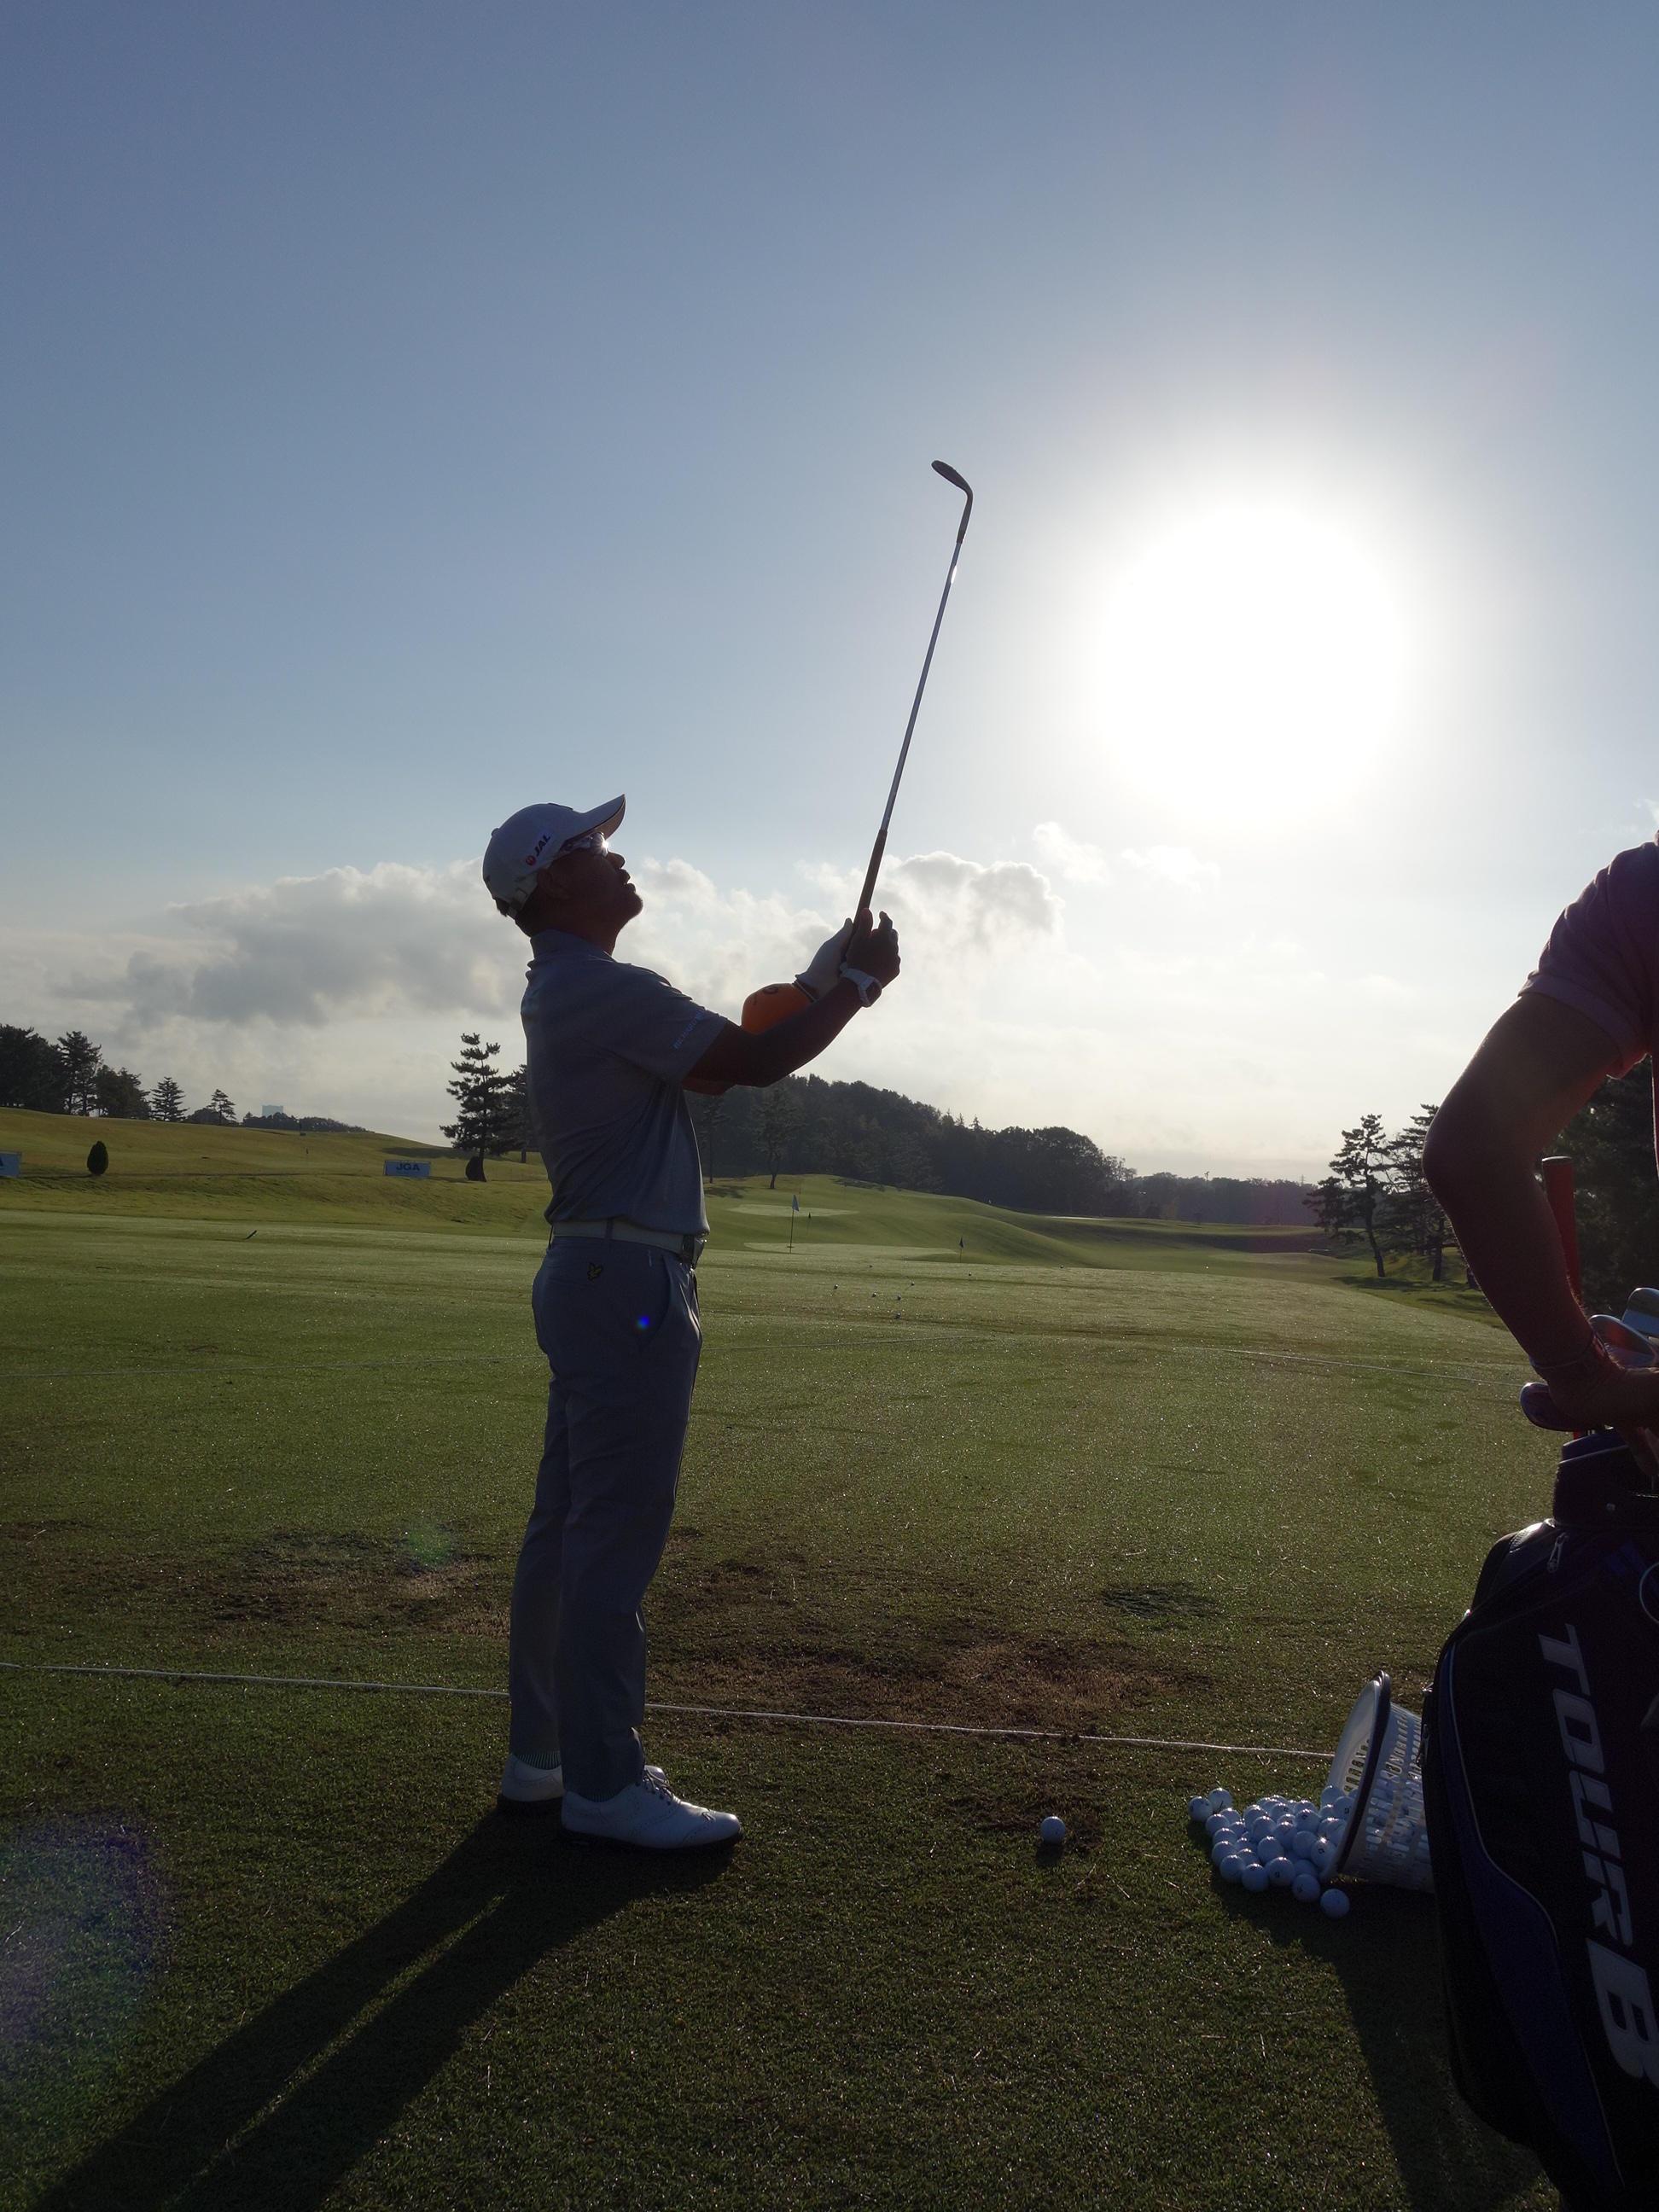 http://www.bs-golf.com/pro/1bf32abb478f0dec9d412887a58a1e3354cc009e.JPG